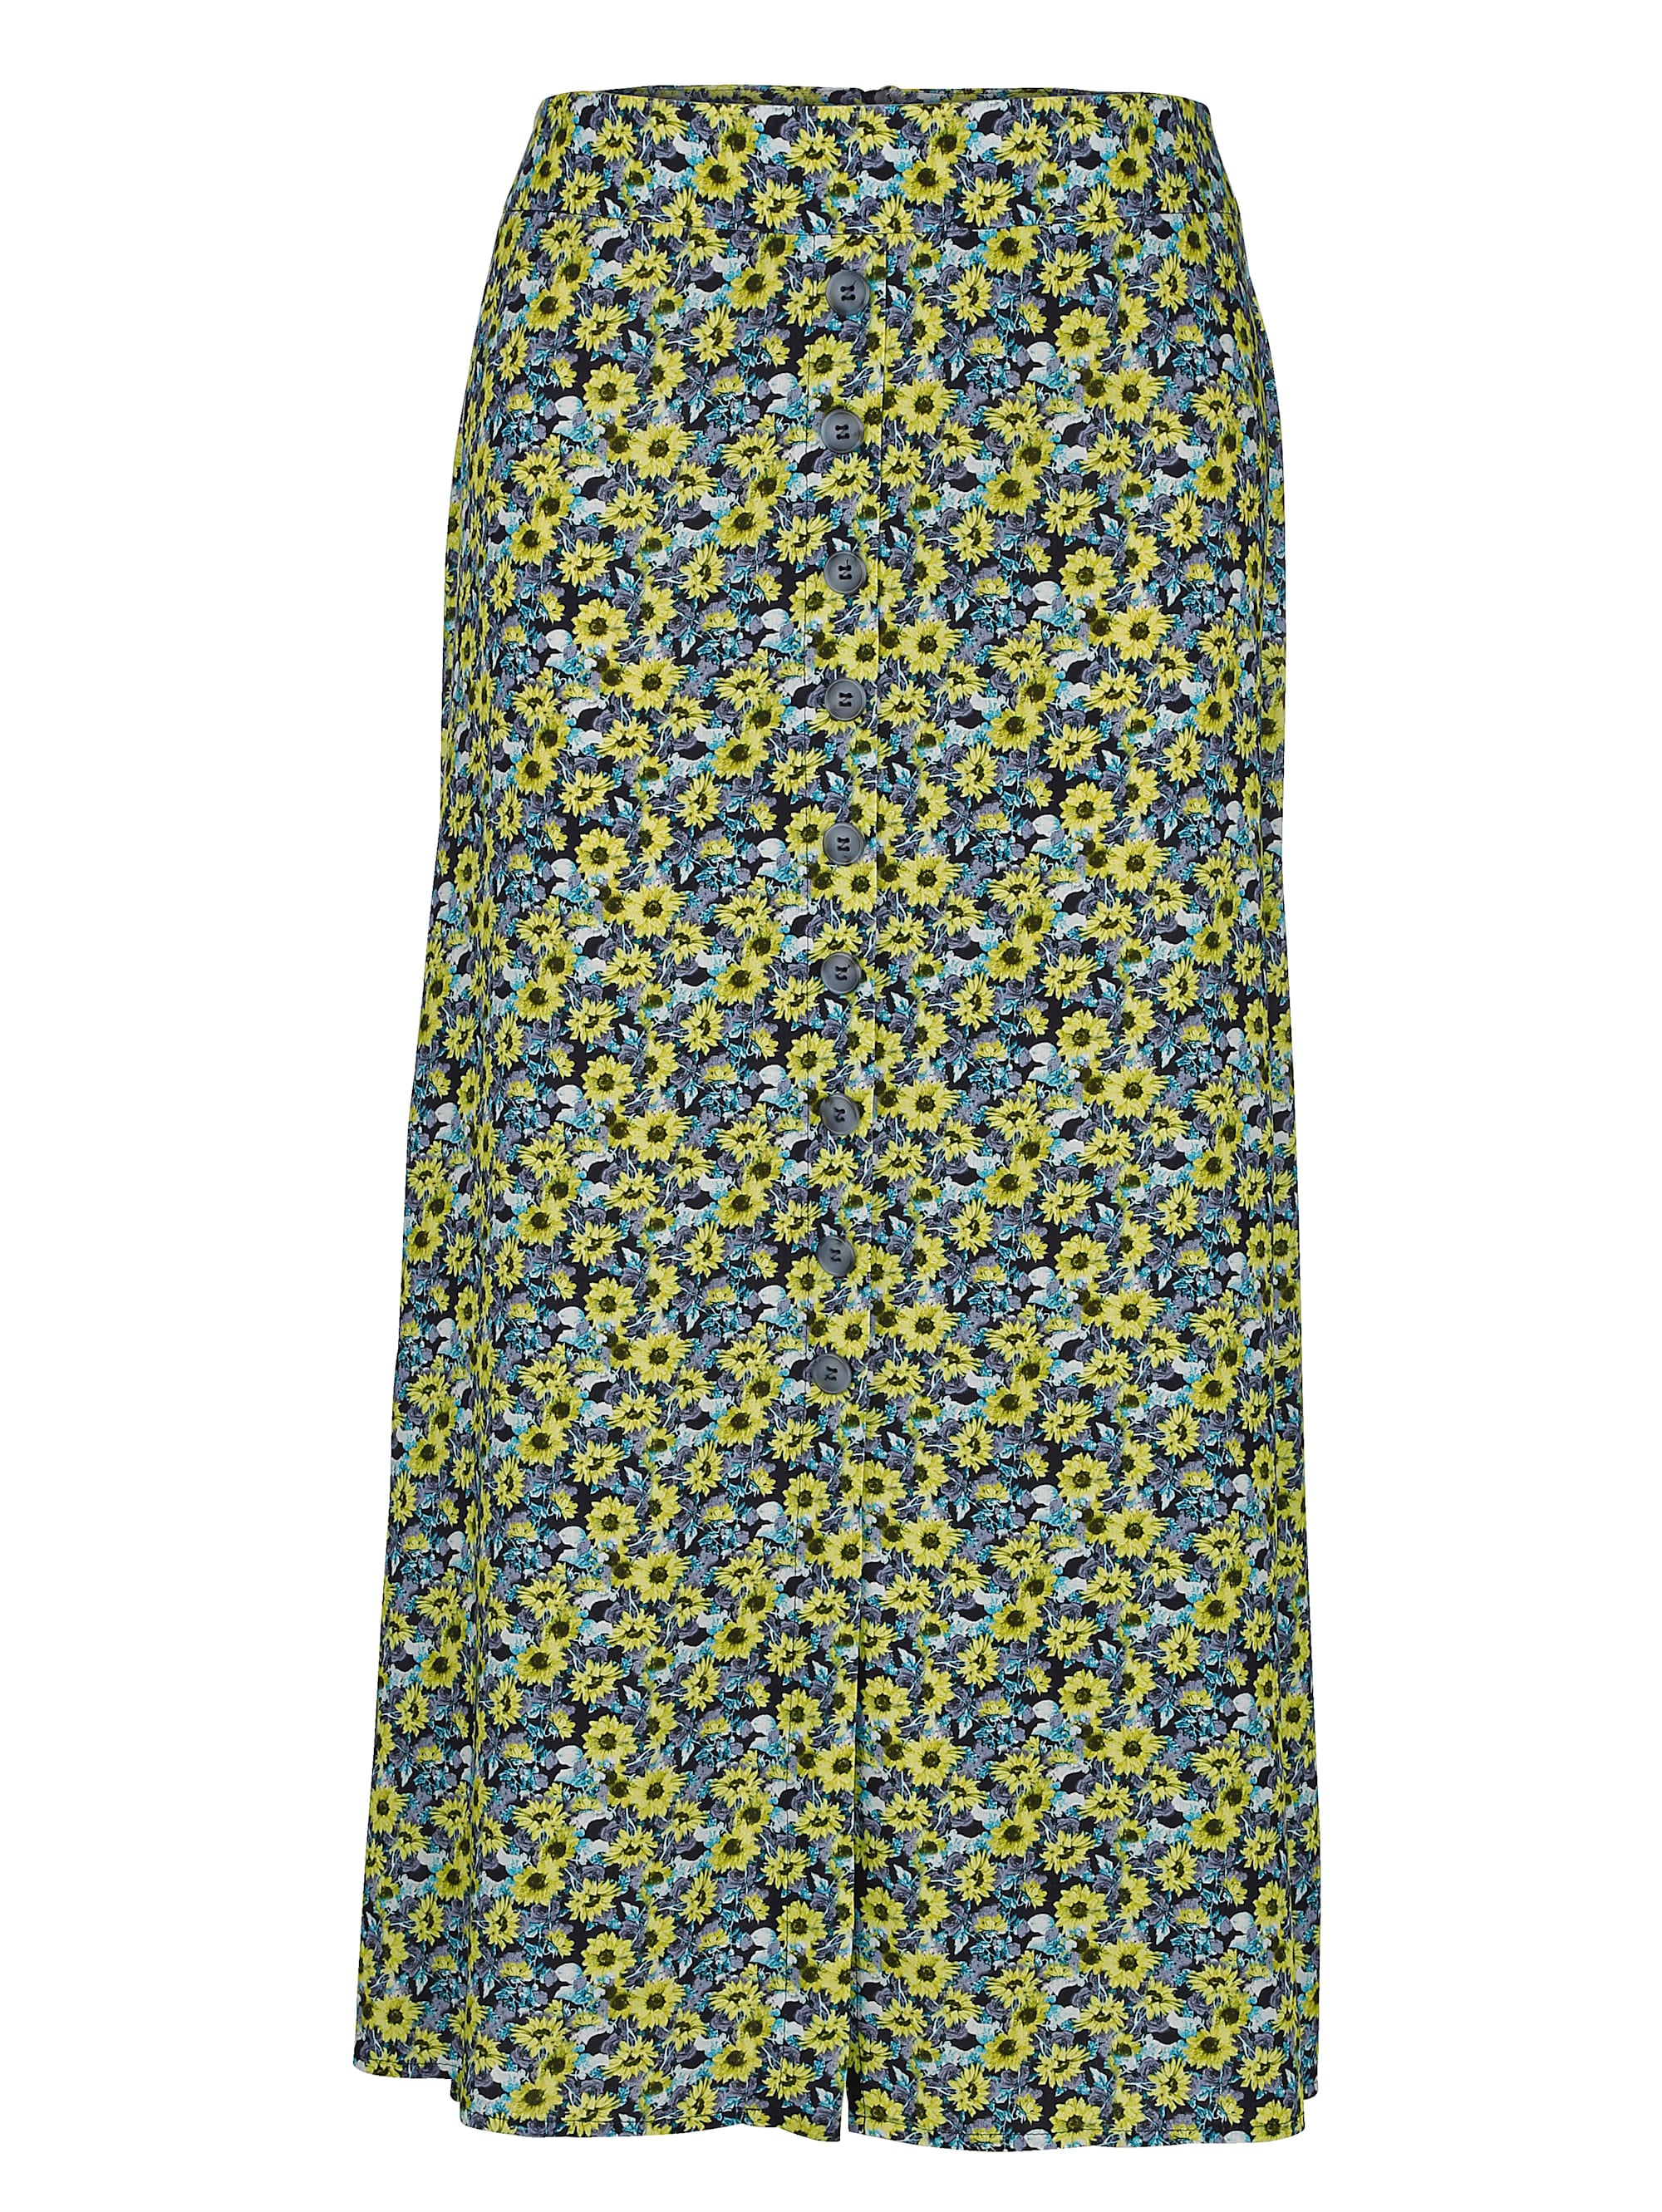 mona -  Sommerrock, mit floralem Muster